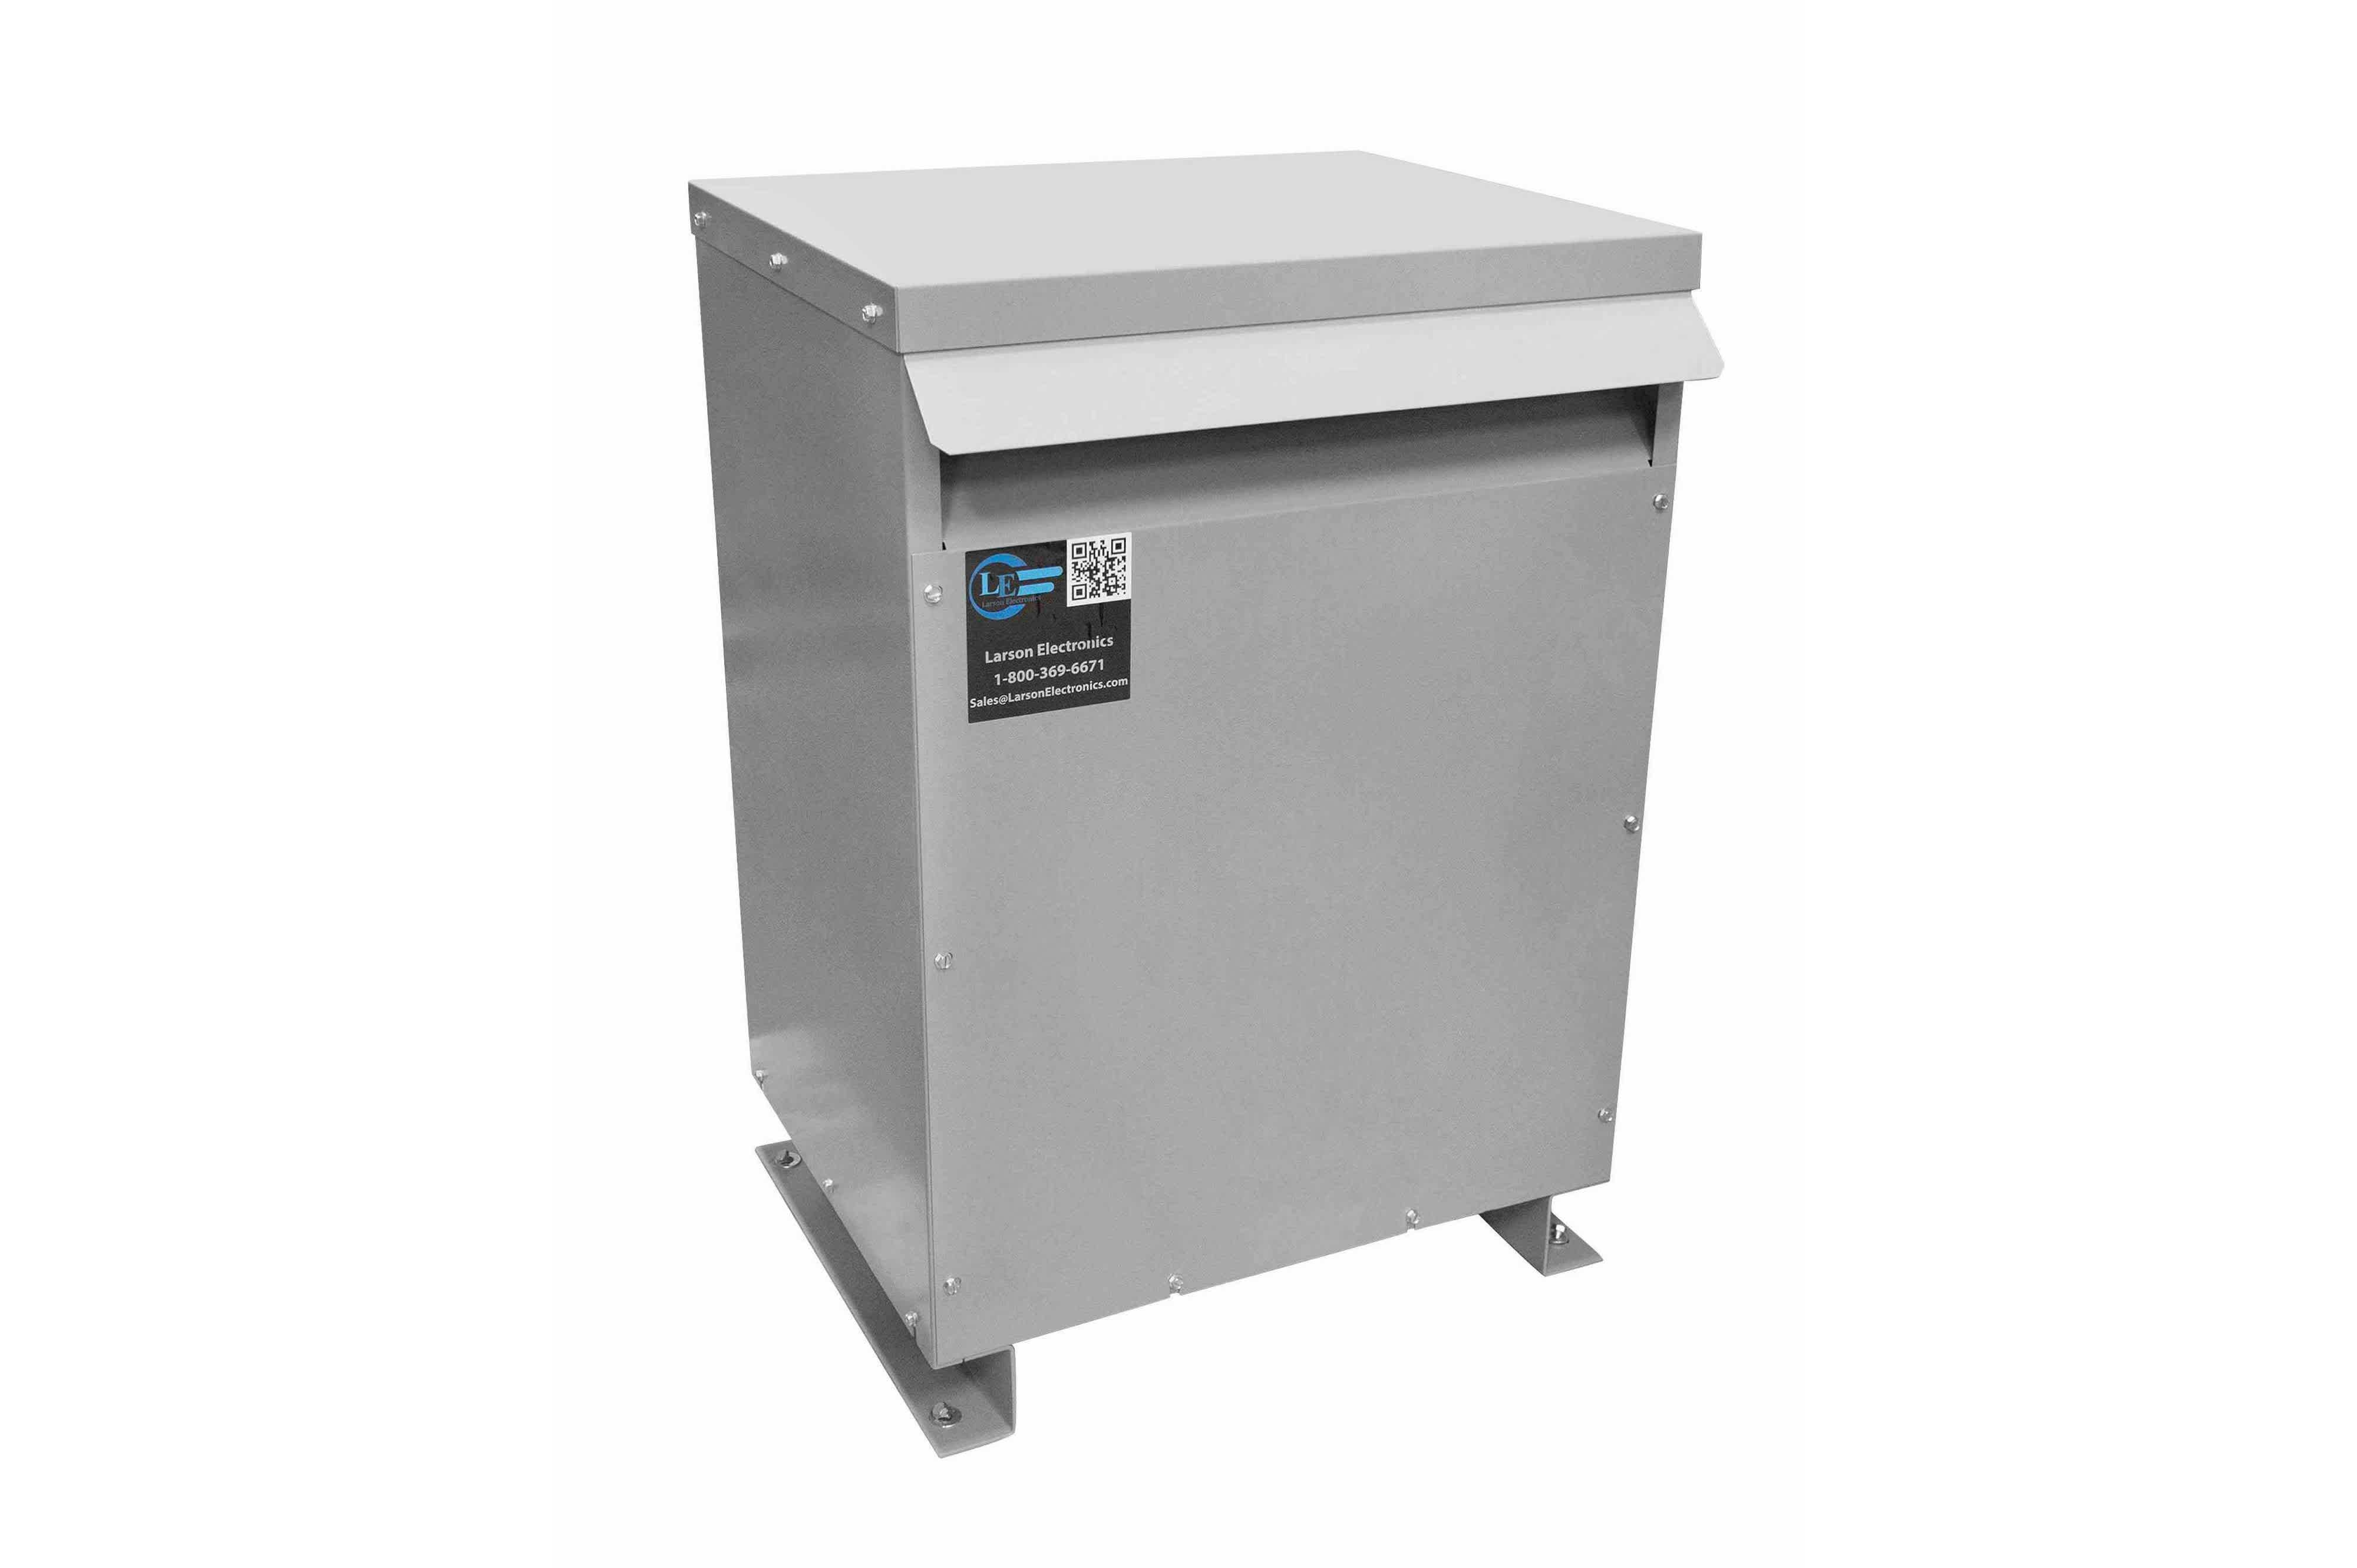 18 kVA 3PH Isolation Transformer, 400V Wye Primary, 480V Delta Secondary, N3R, Ventilated, 60 Hz